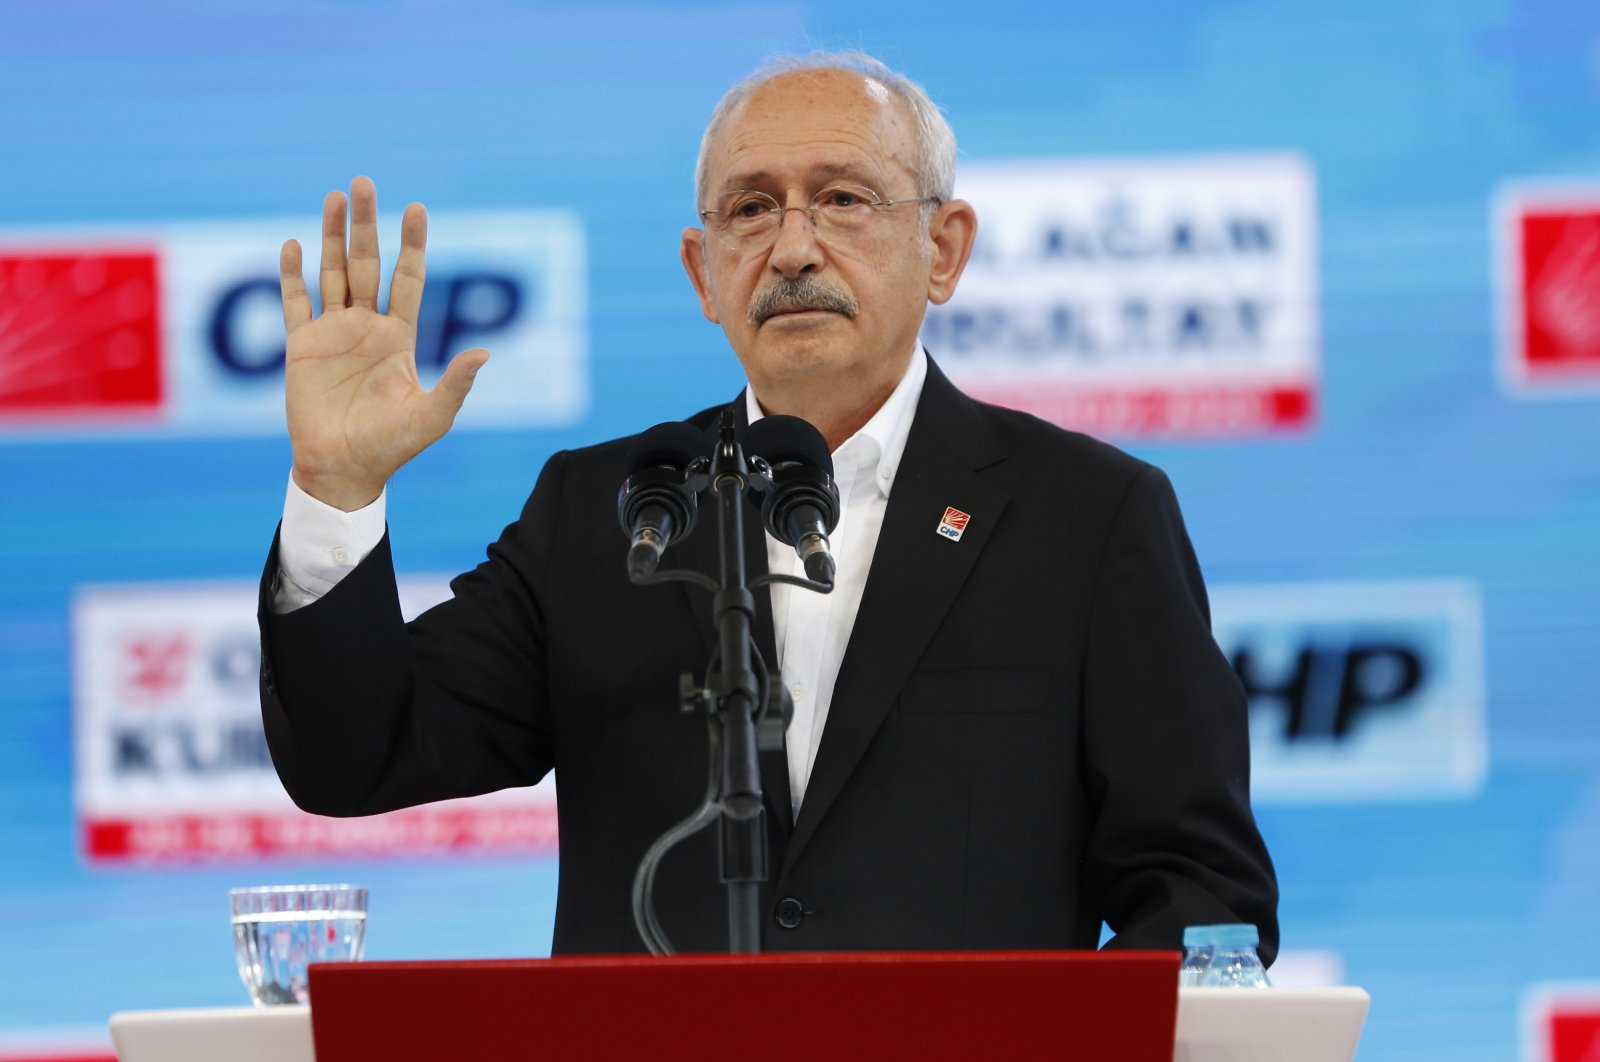 CHP Chairman Kemal Kılıçdarıoğlu at the 37th general congress, July 25, 2020. (AA Photo)